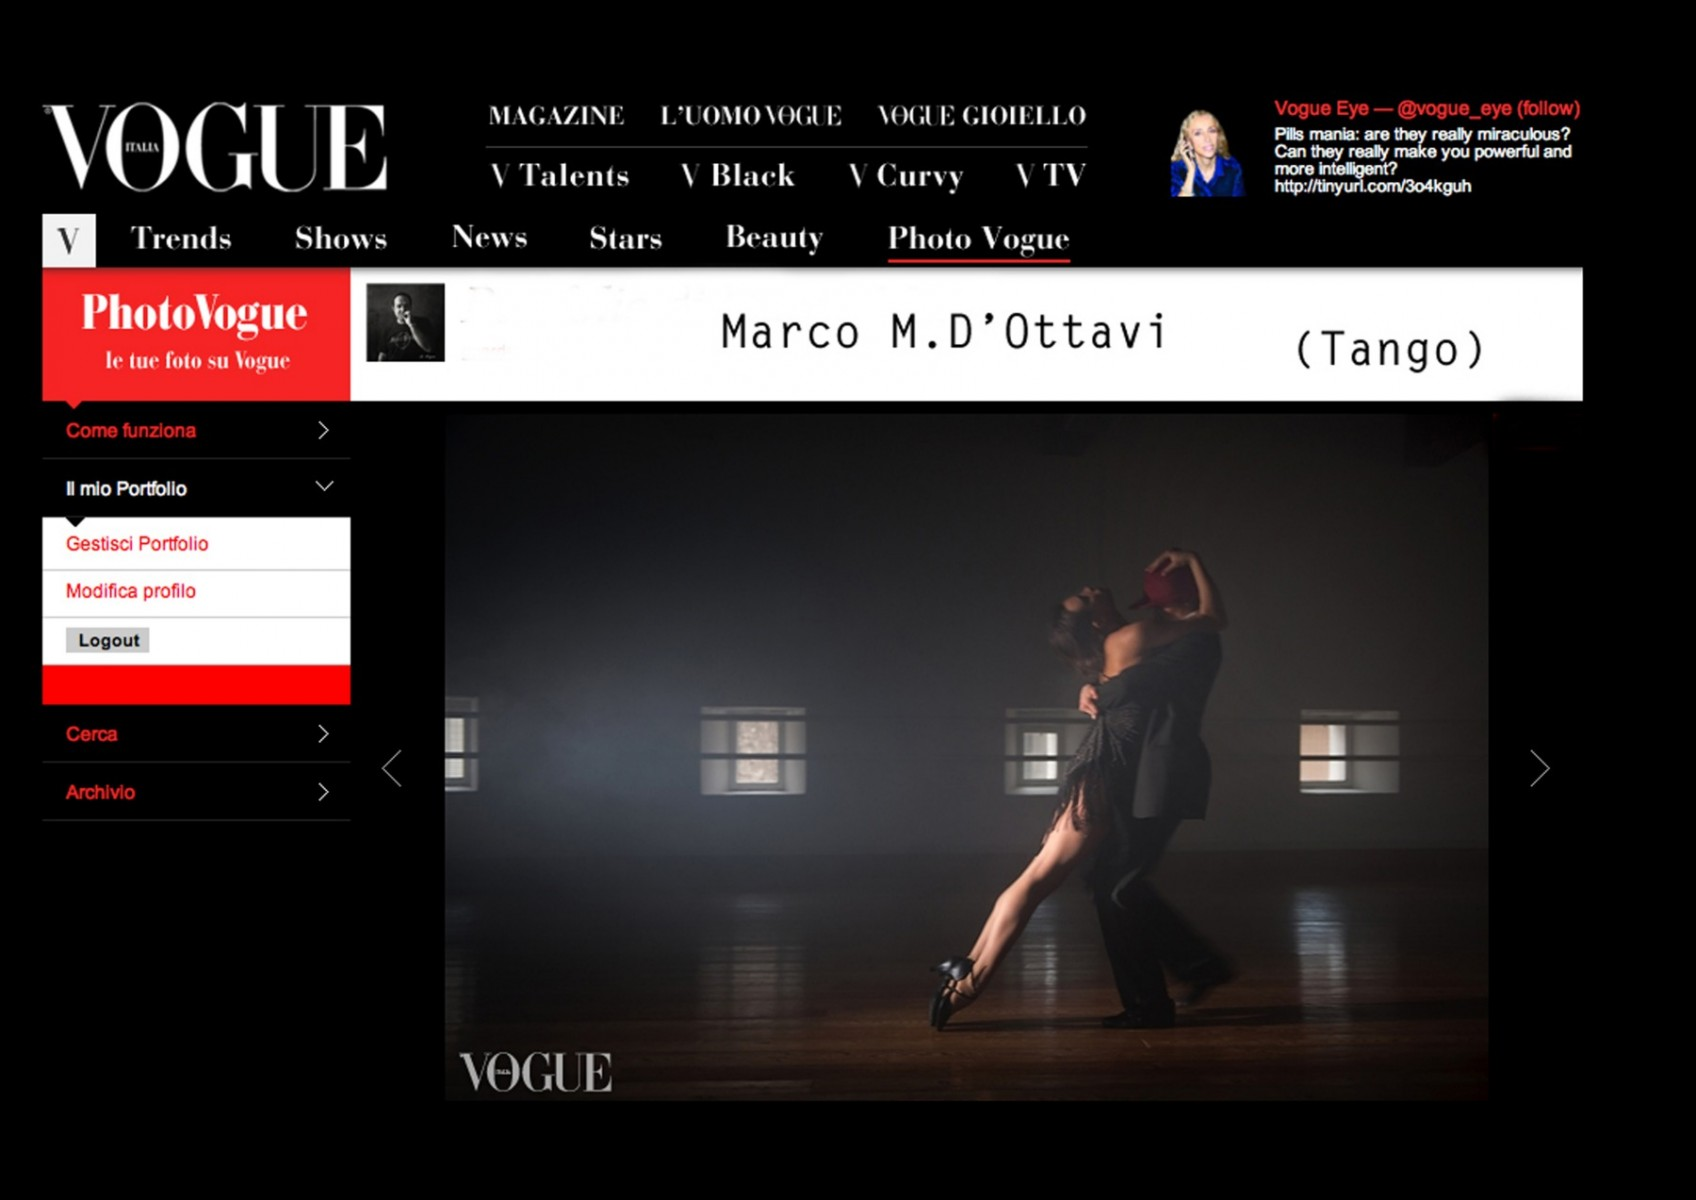 Tango on Vogue